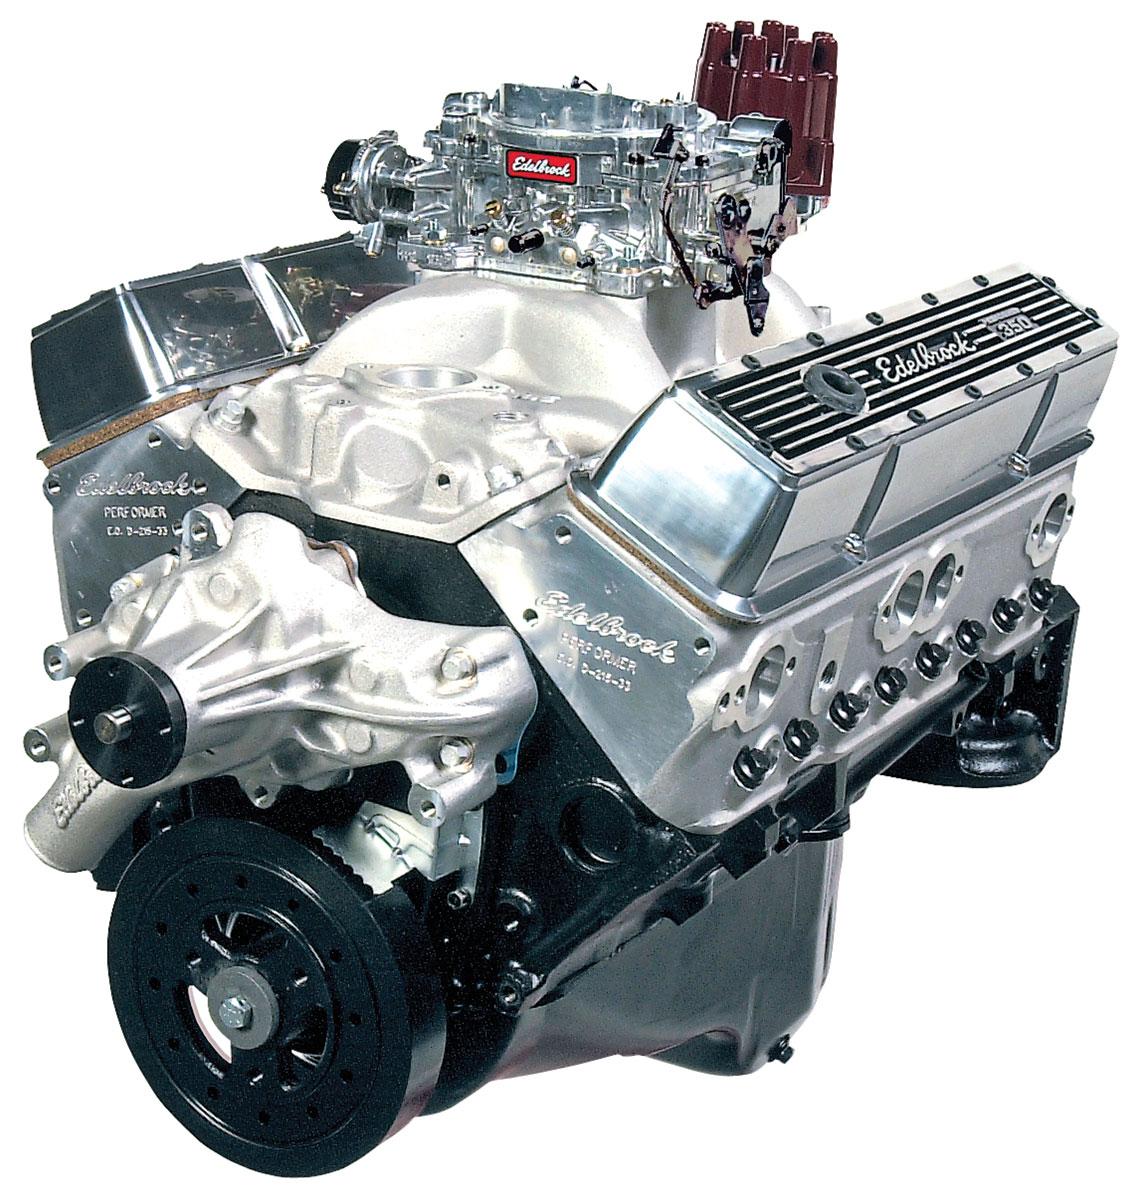 Photo of El Camino Crate Engine, Edelbrock Performer Performer Eps Manifold & 650 Cfm Thunder Series Avs Carburetor short water pump, satin